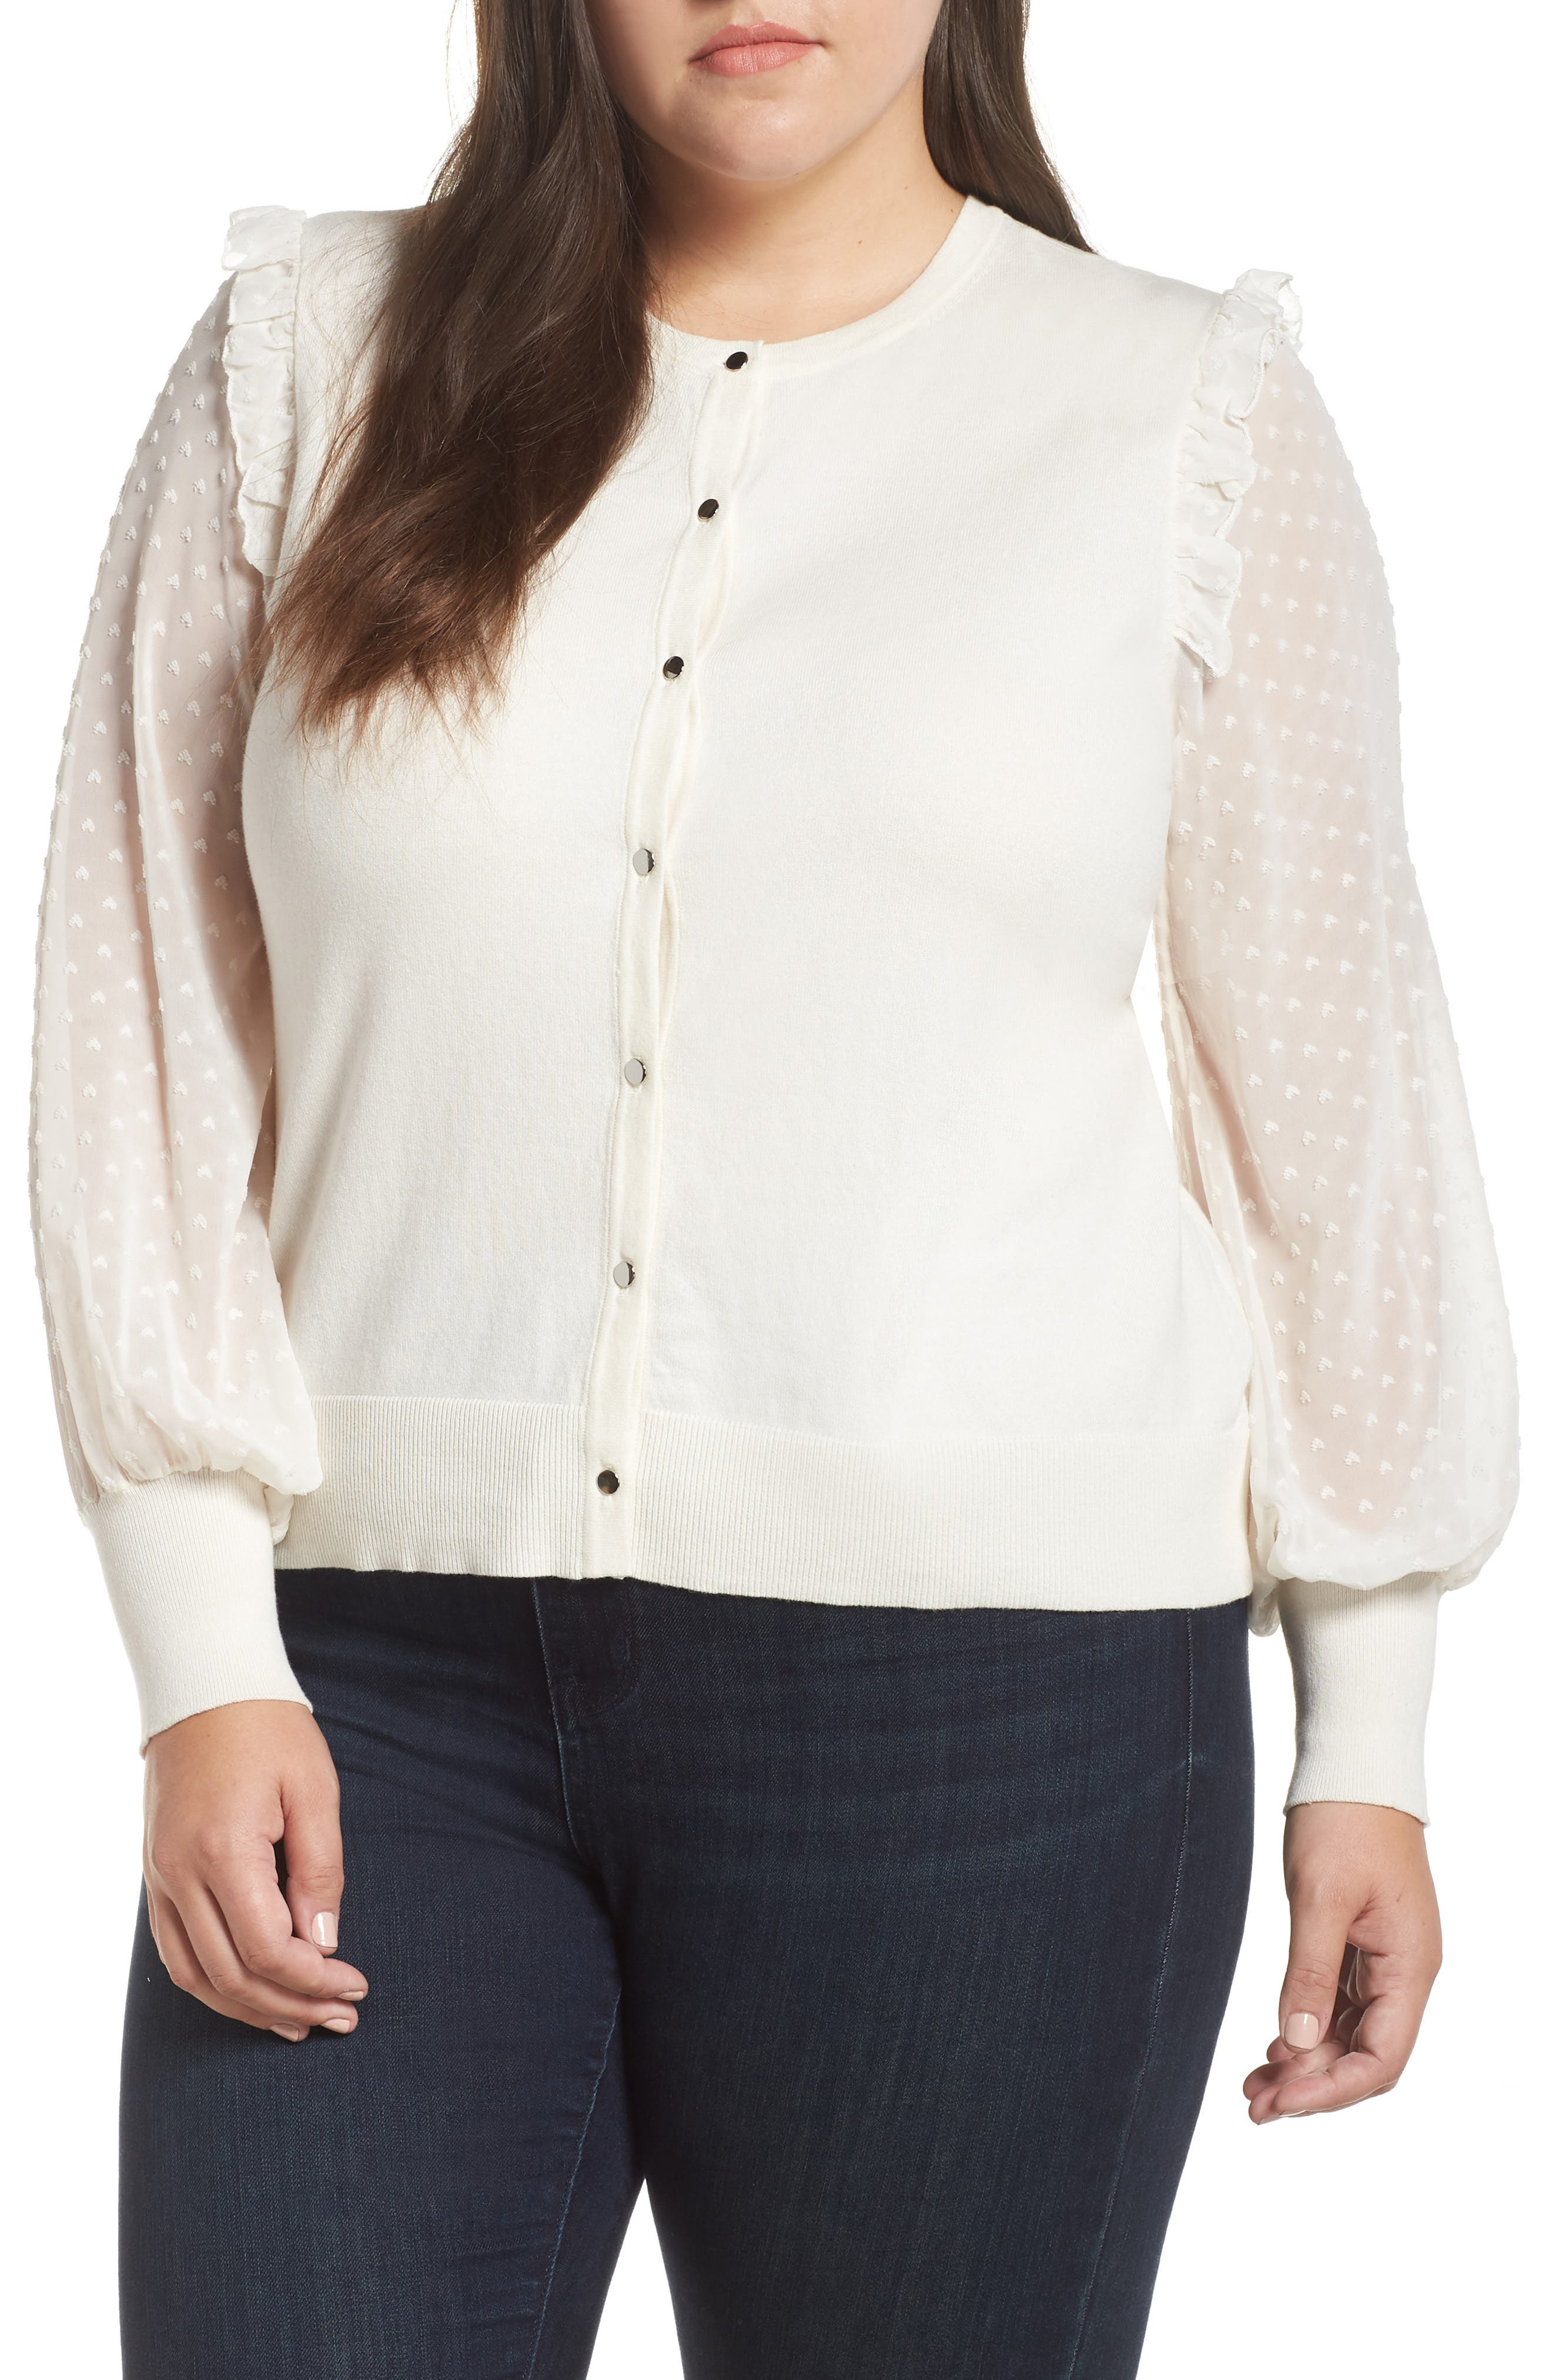 1930s Style Blouses, Shirts, Tops | Vintage Blouses Plus Size Womens Cece Clip Dot Ruffle Cardigan $99.00 AT vintagedancer.com